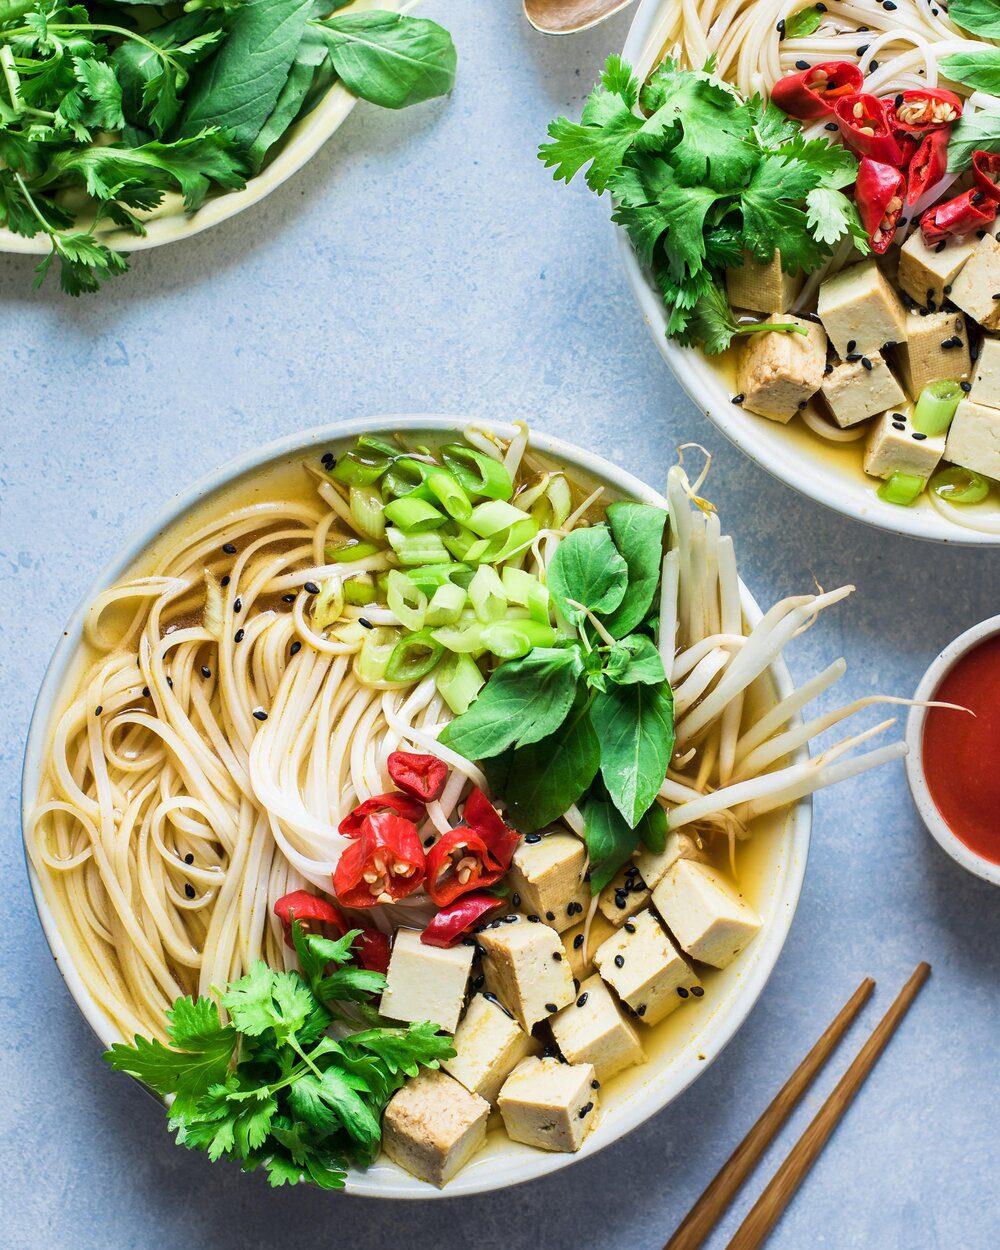 Healthy Vegan Instant Pot Recipes to Make This Winter. Vegan Instant Pot Pho.